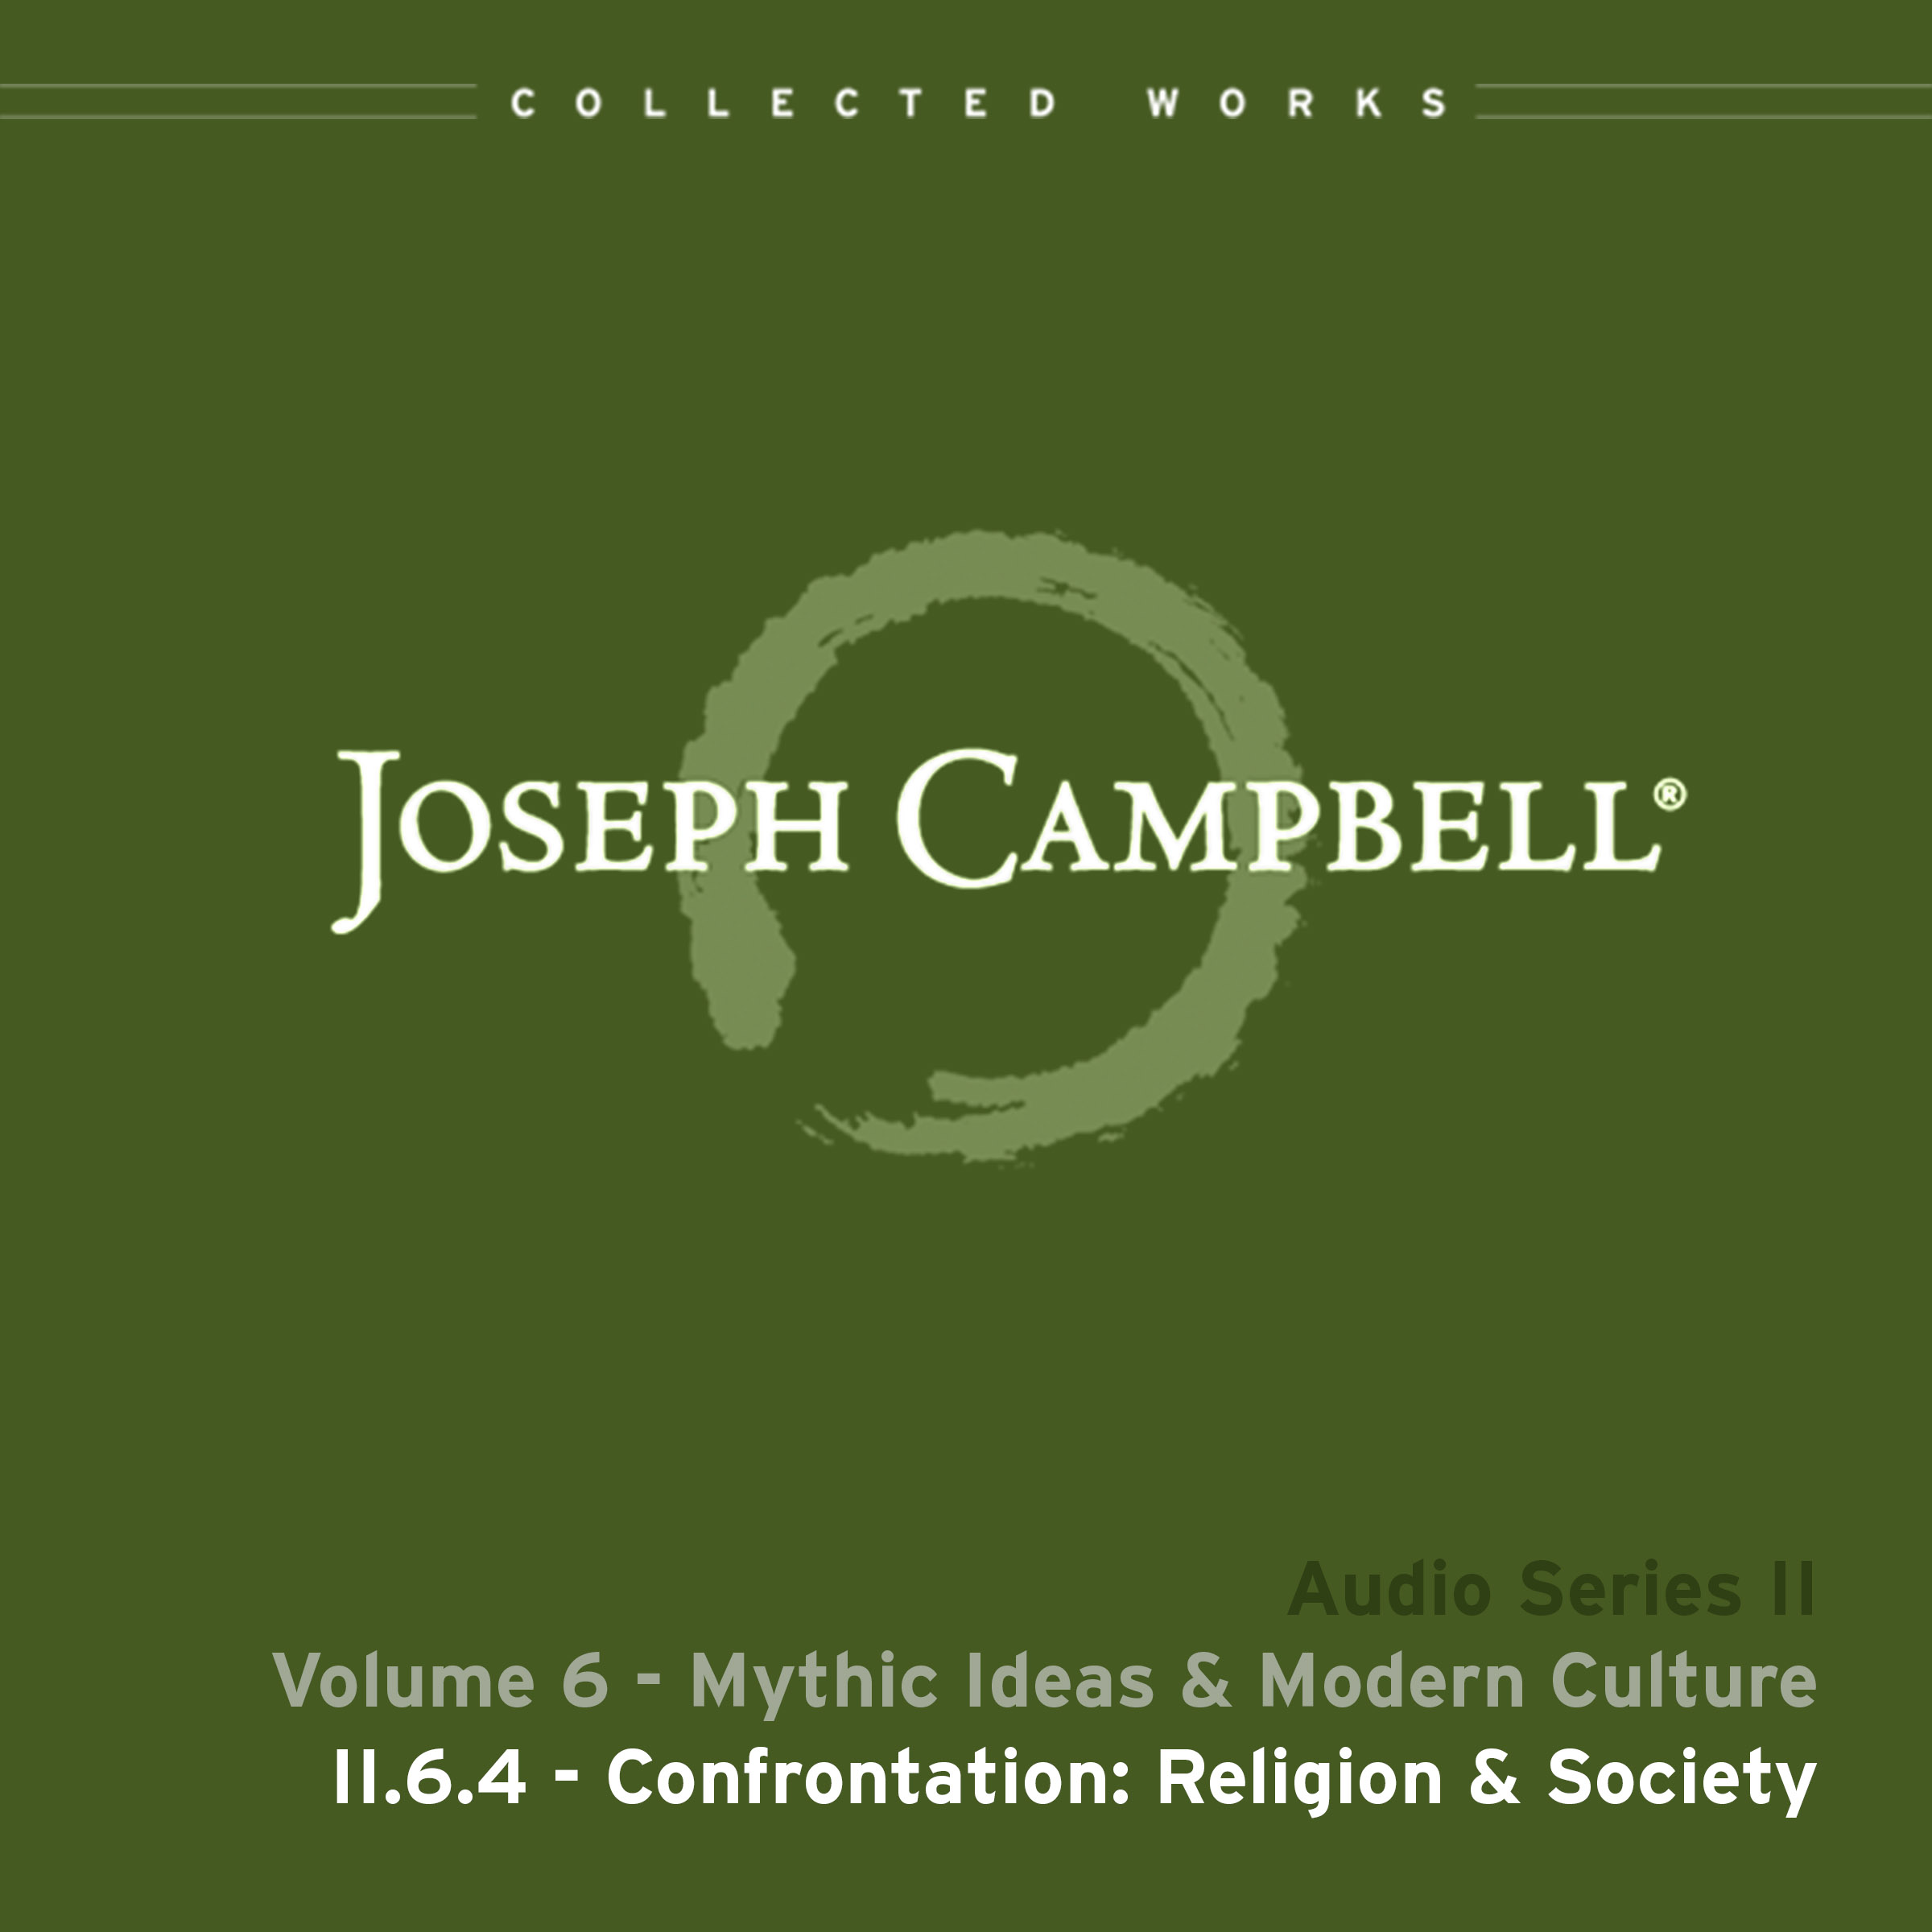 Audio: Lecture II.6.4 - Confrontation - Religion & Society